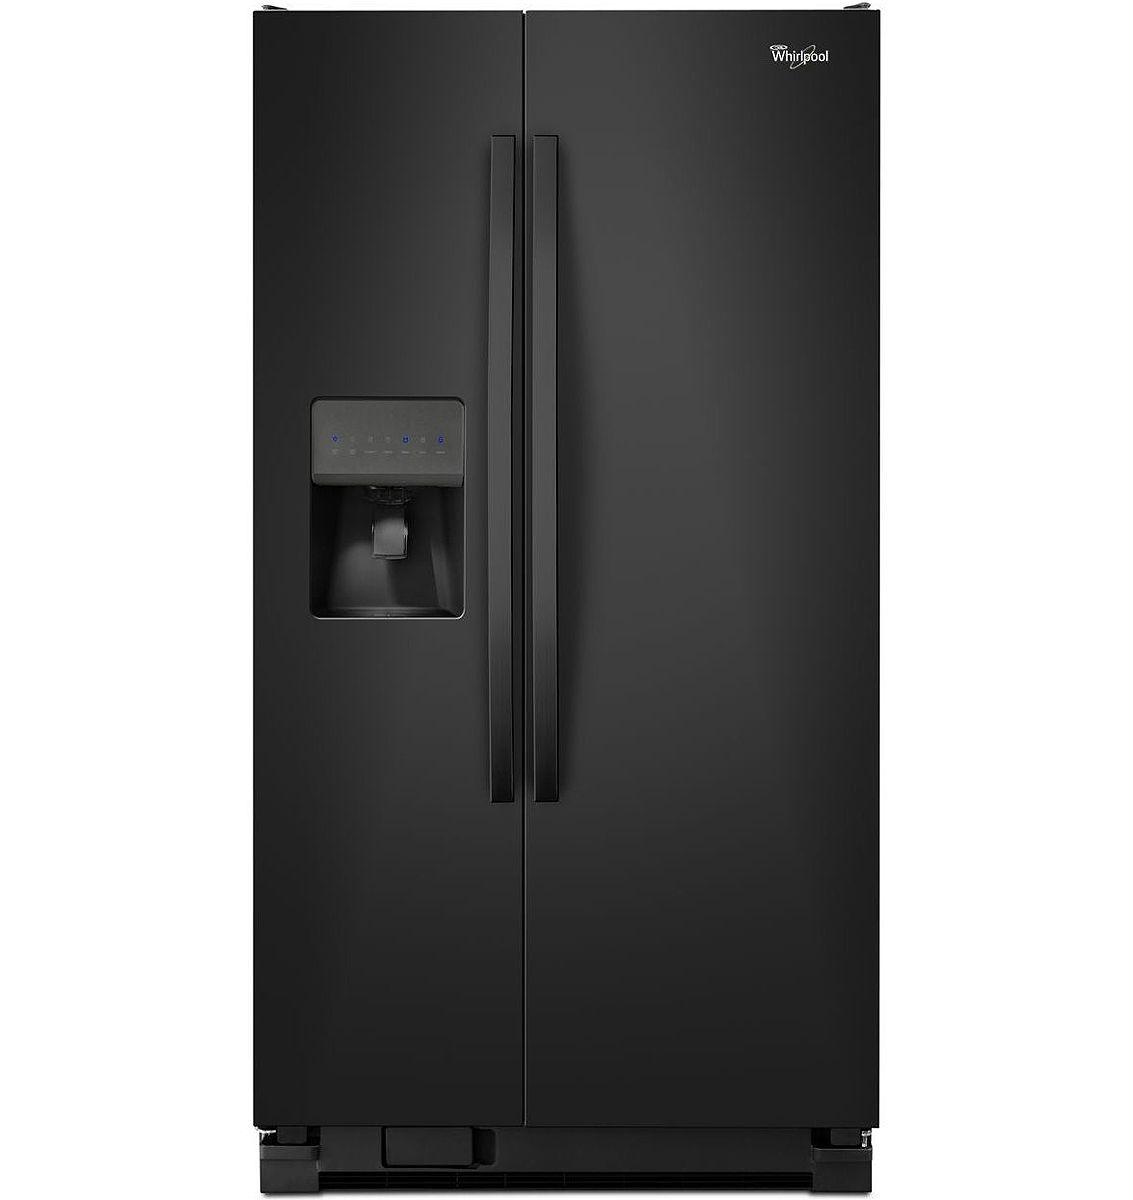 Whirlpool black side by side refrigerator wrs335fddb - Whirlpool side by side ...